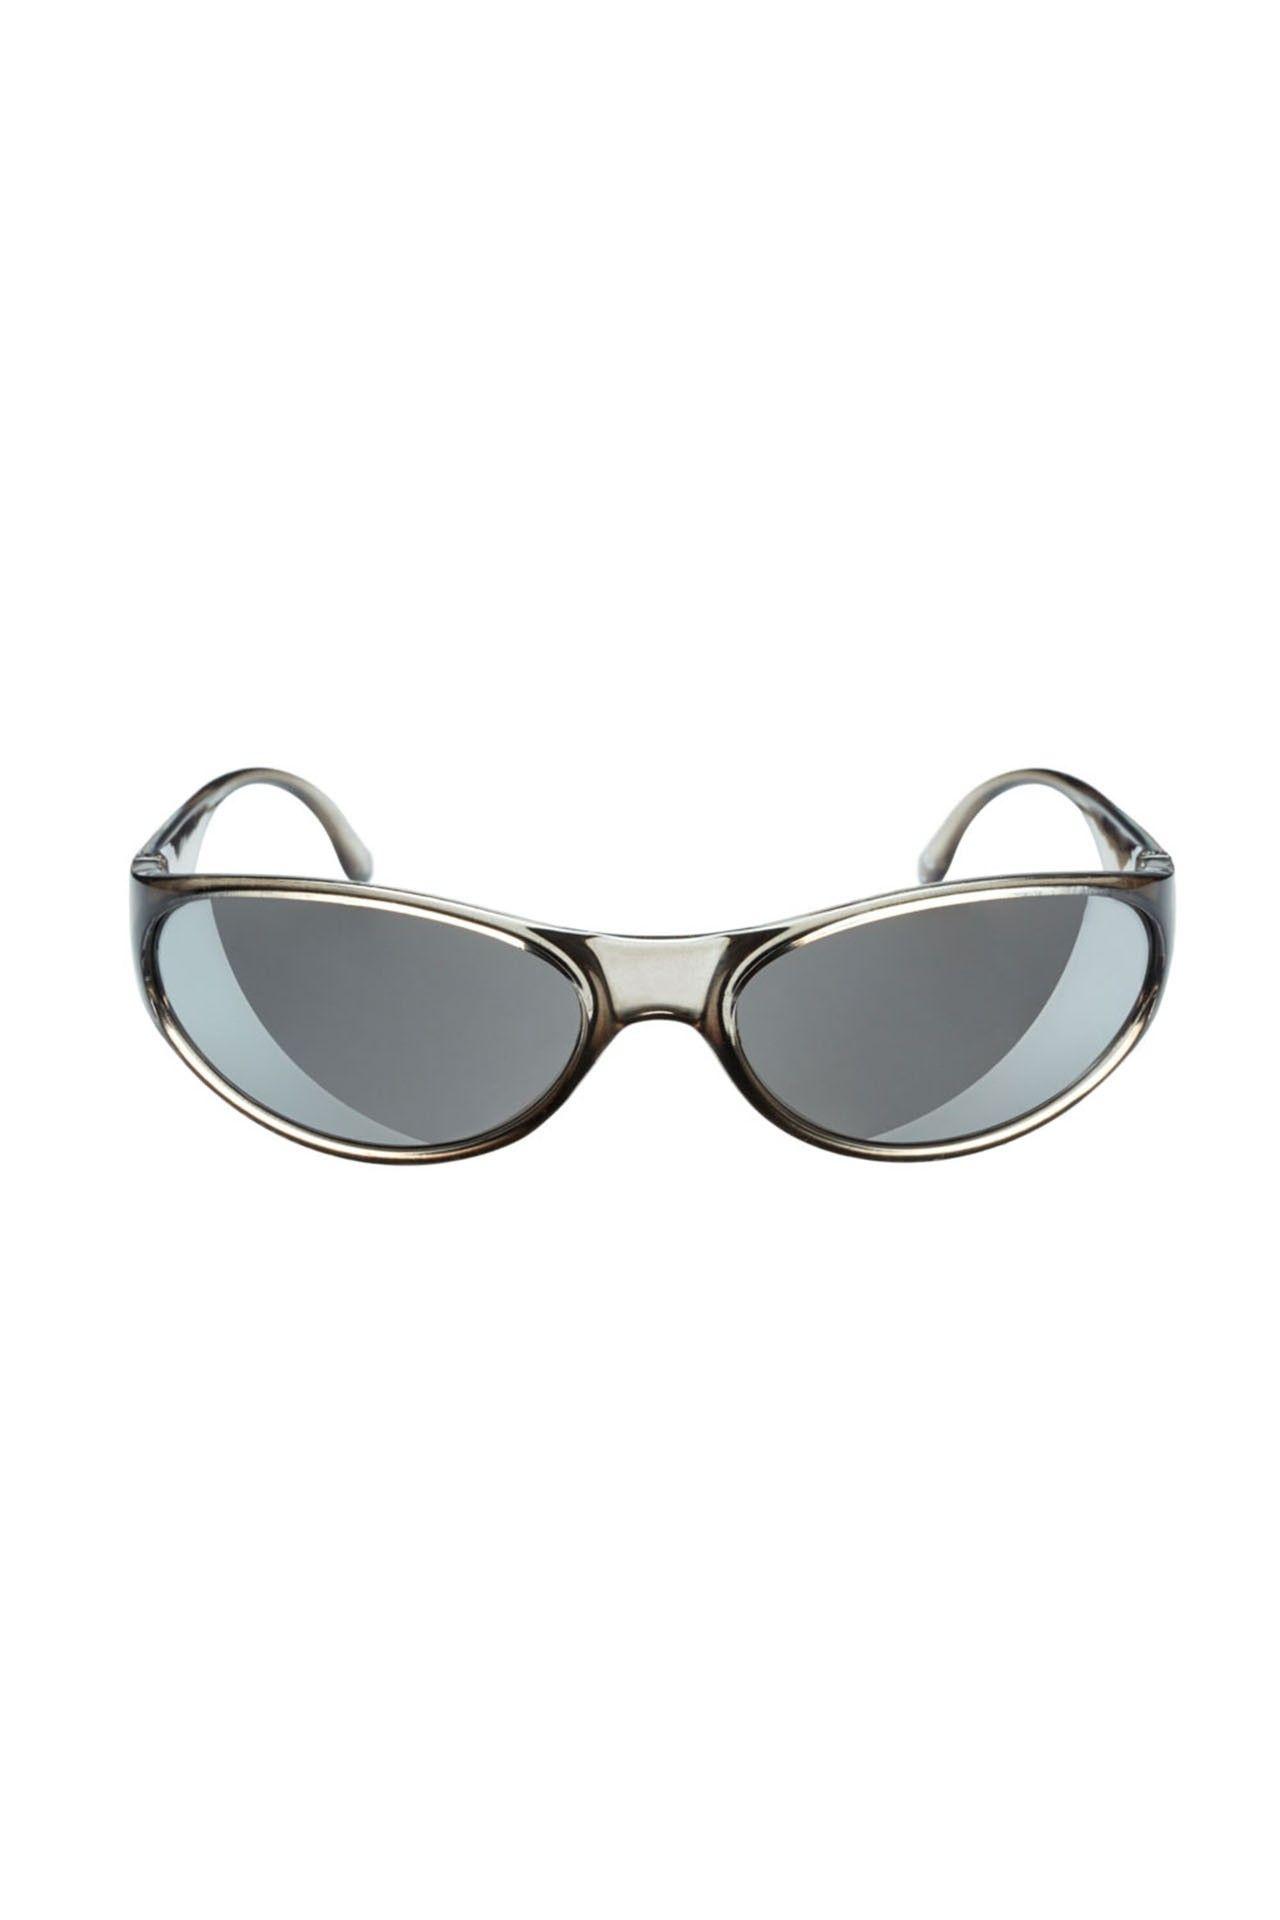 Afbeelding van Icon Eyewear Zonnebril 10842 Dark Clear Grey B